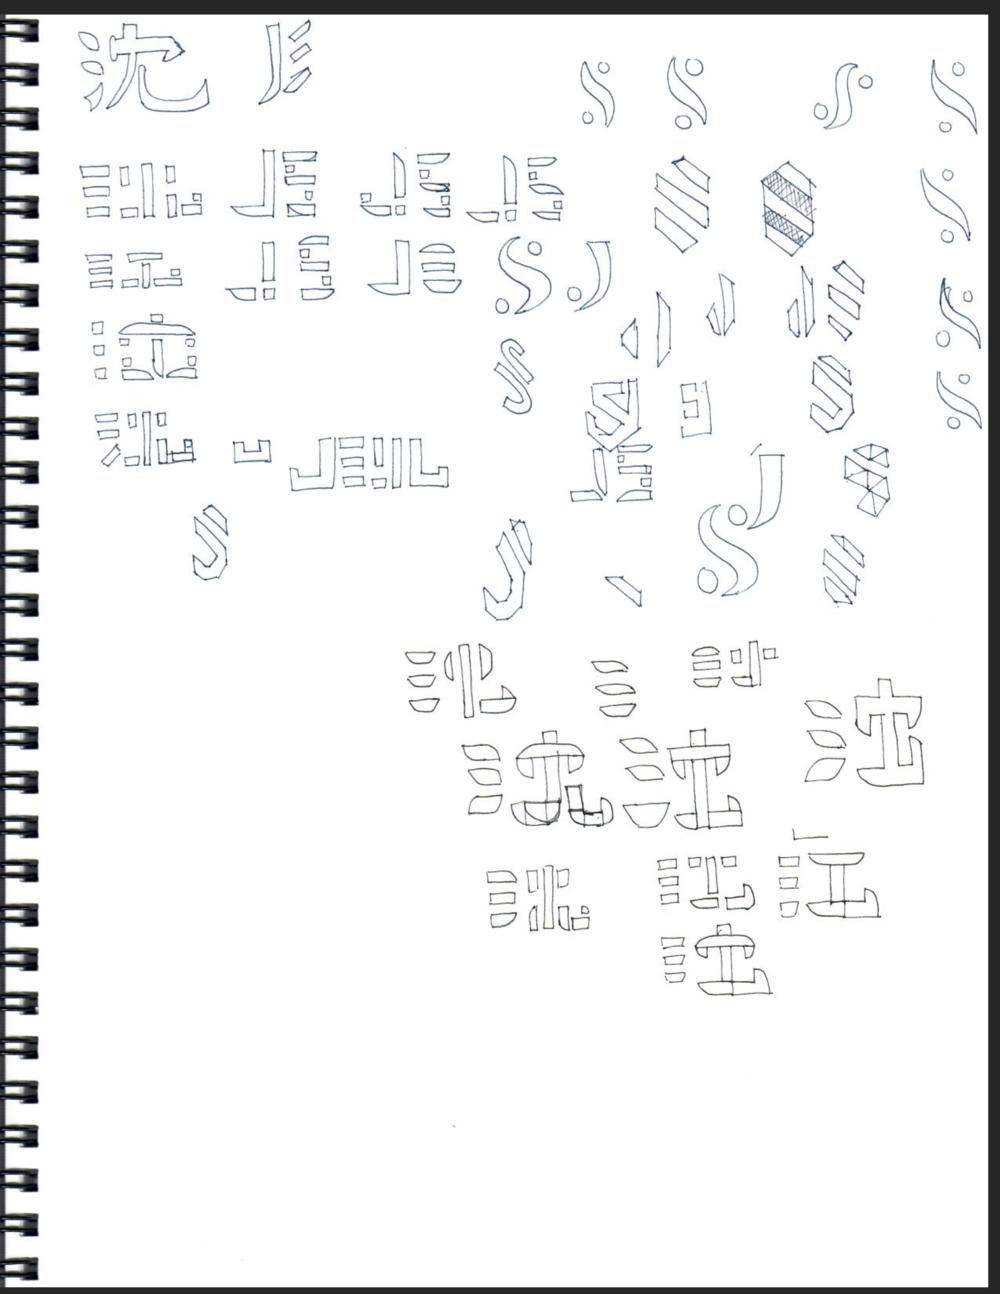 brainstorm.png